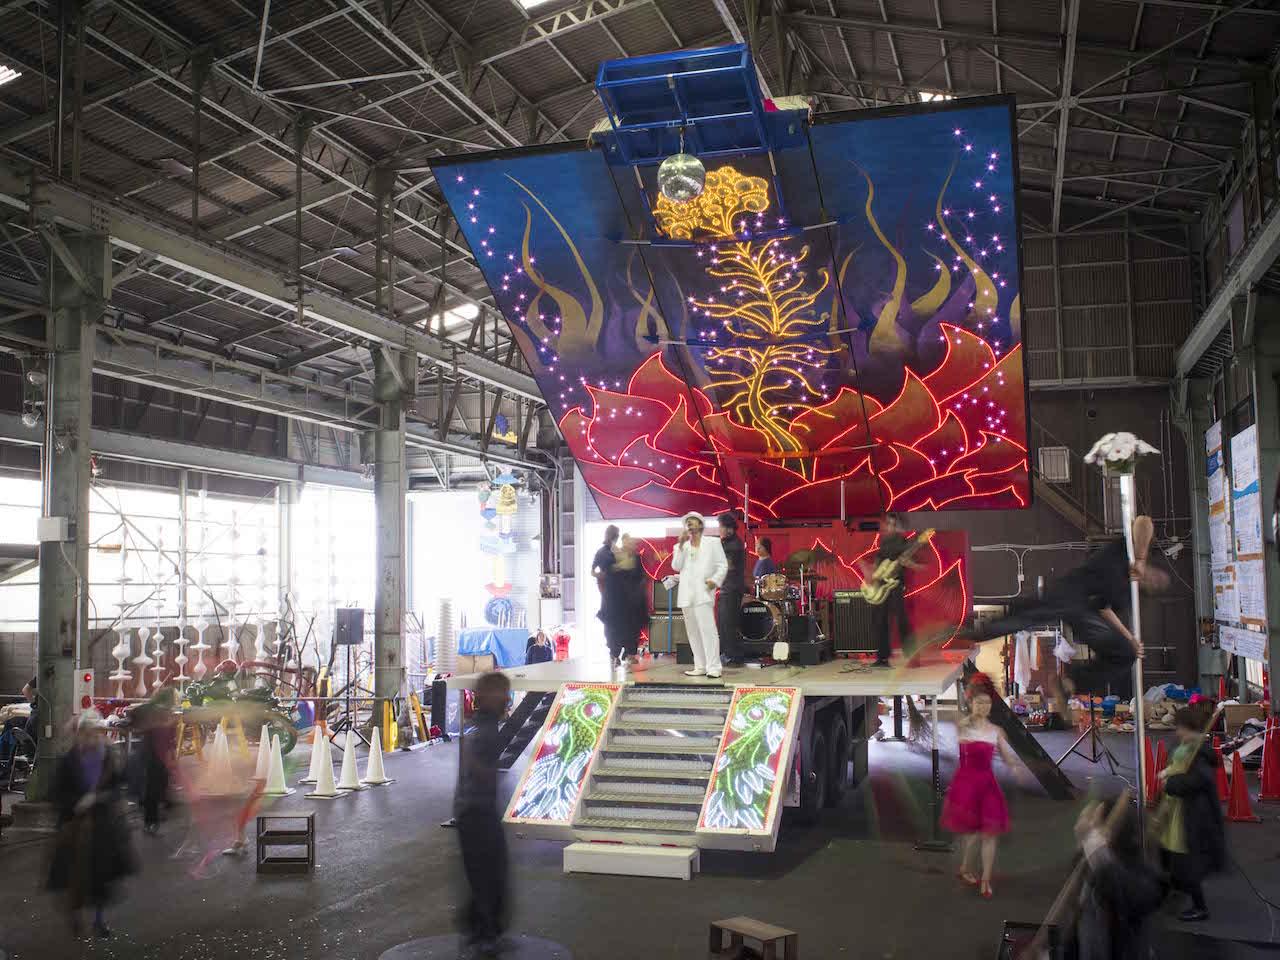 MASK (MEGA ART STORAGE KITAKAGAYA)  Open Storage 2016 開催 やなぎみわ、ステージトレーラー「日輪の翼」大阪凱旋公演